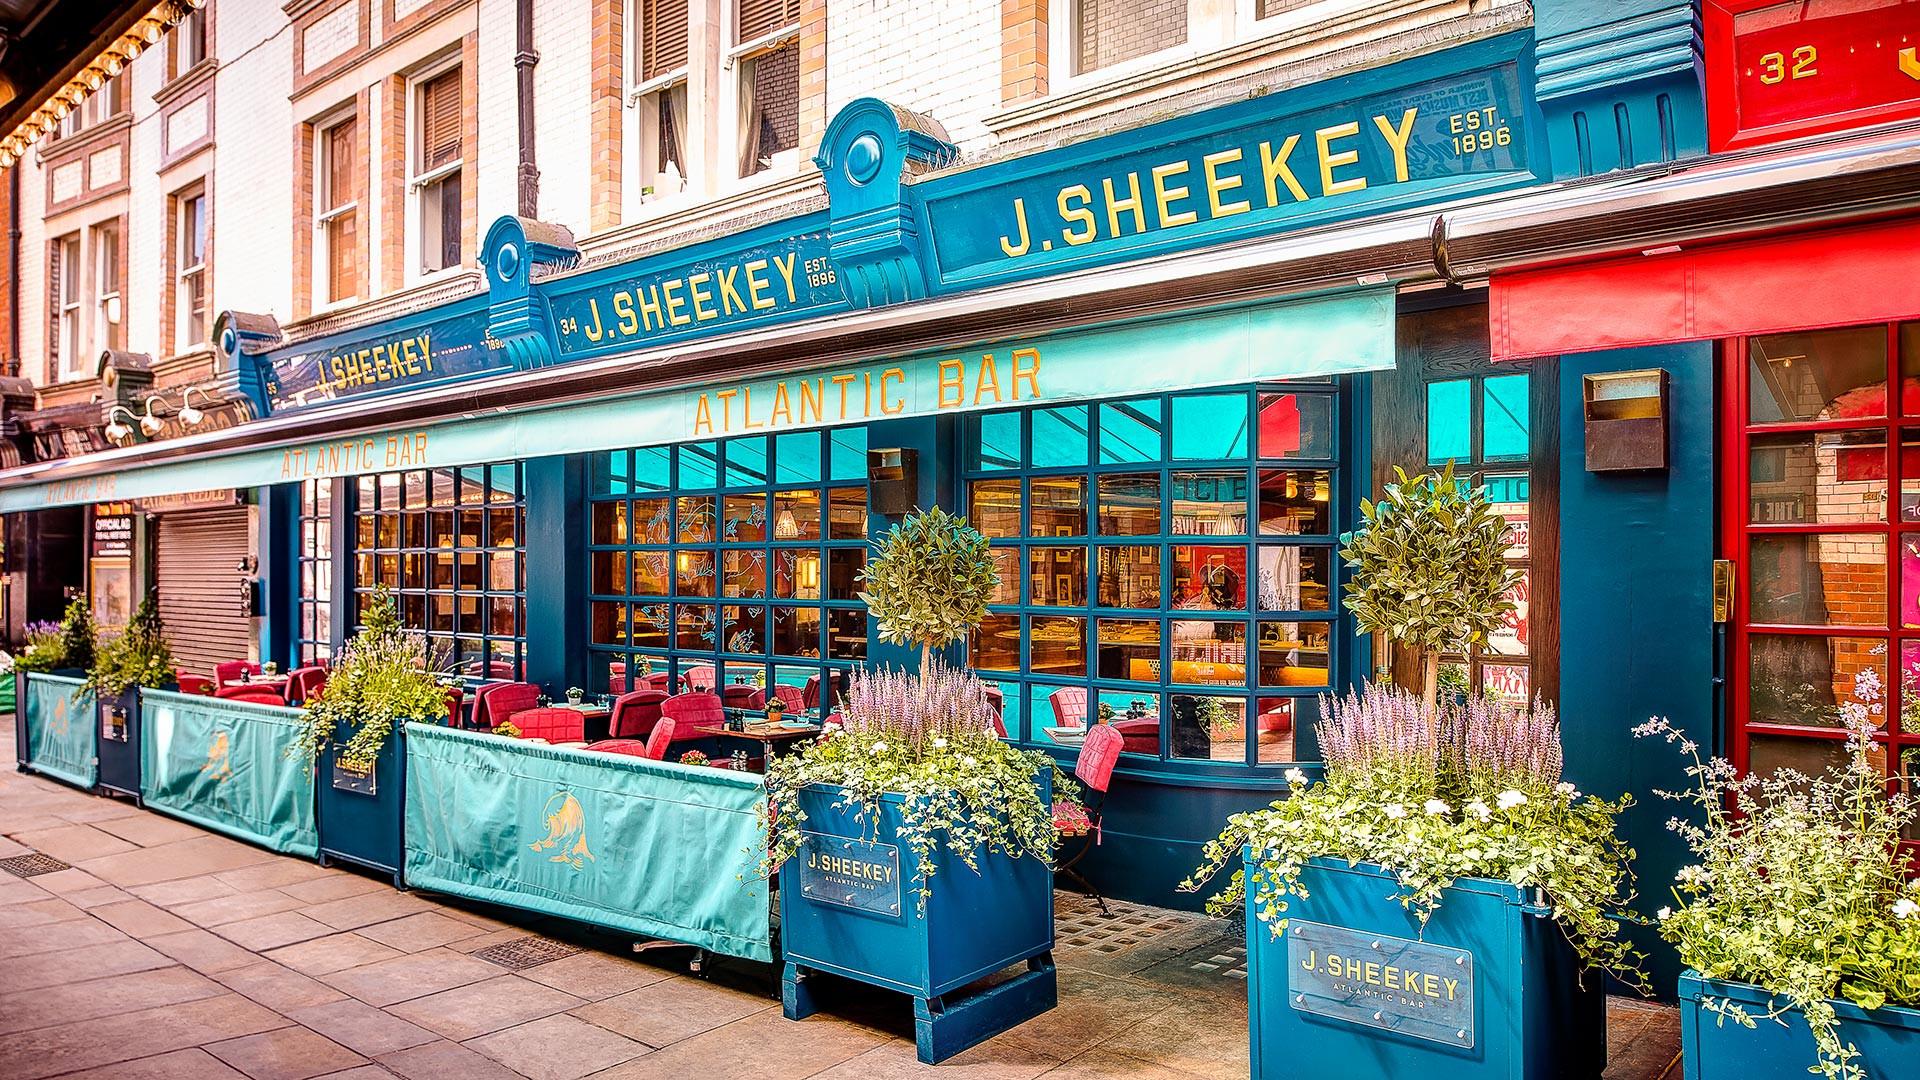 Seafood mecca J Sheekey